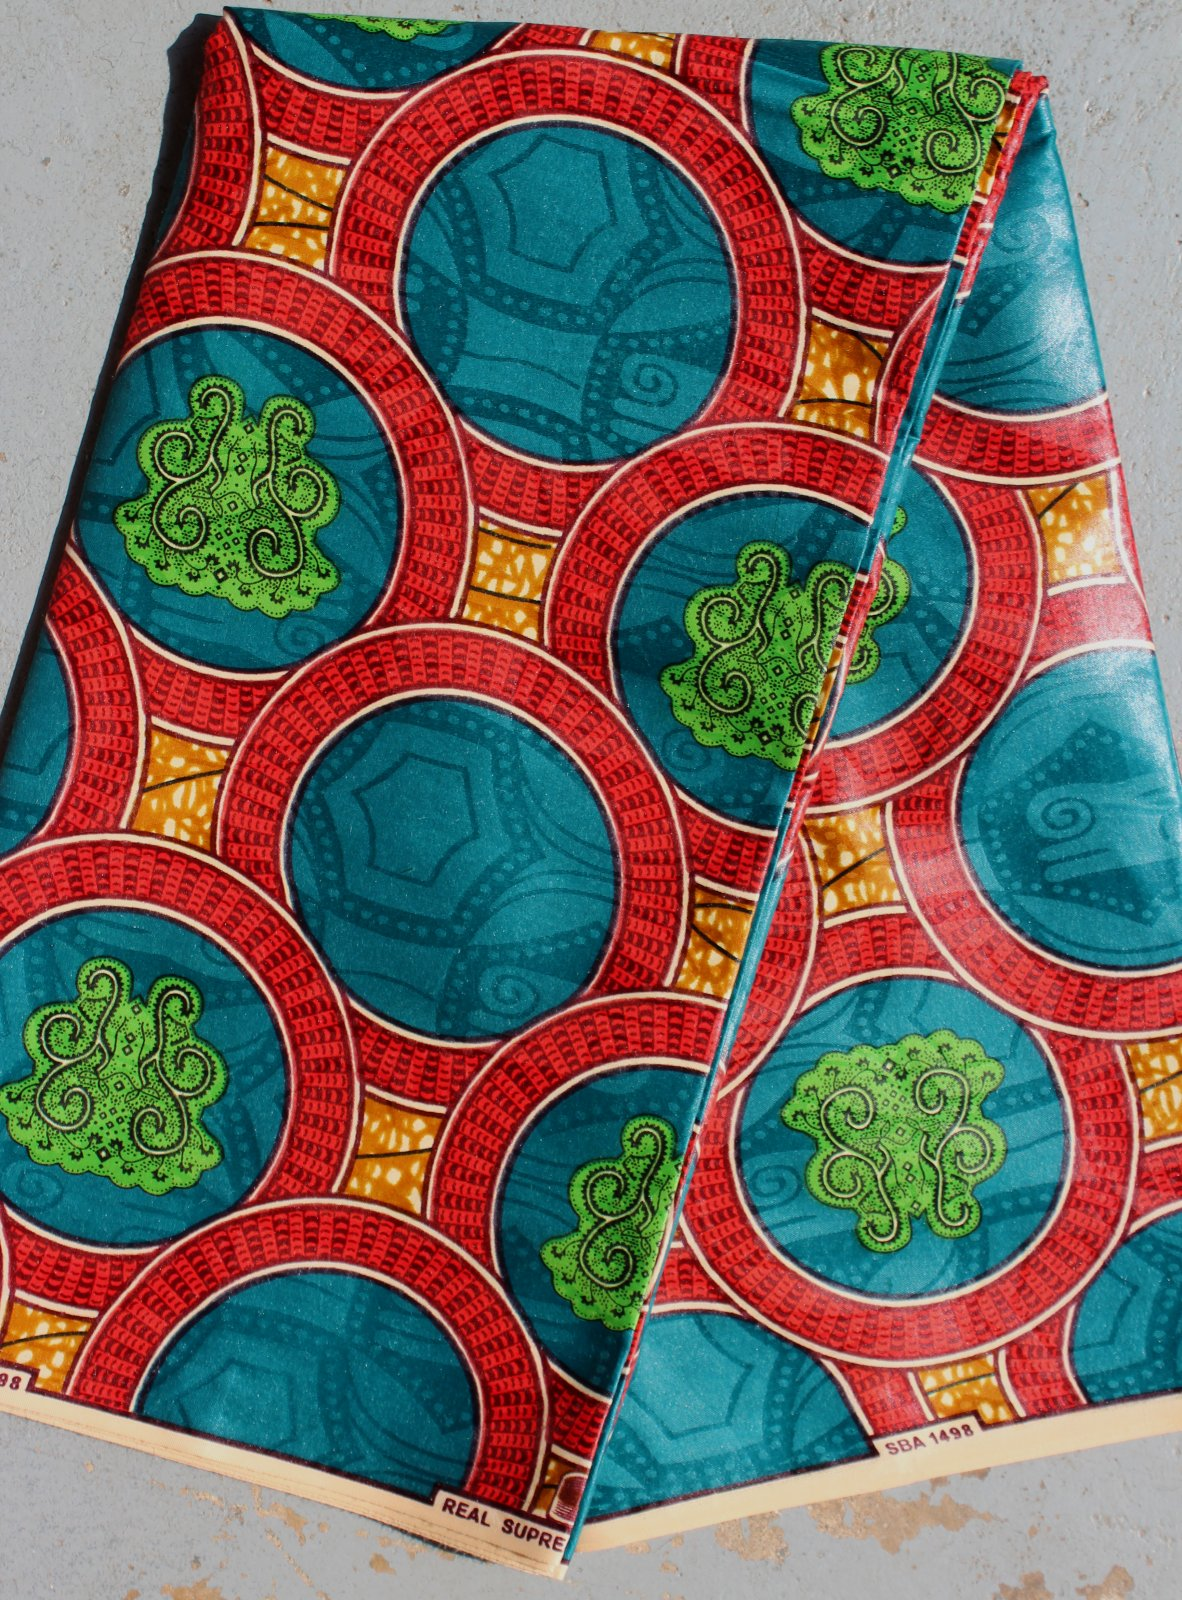 Dutch Printed Damask Fabric (red) #657